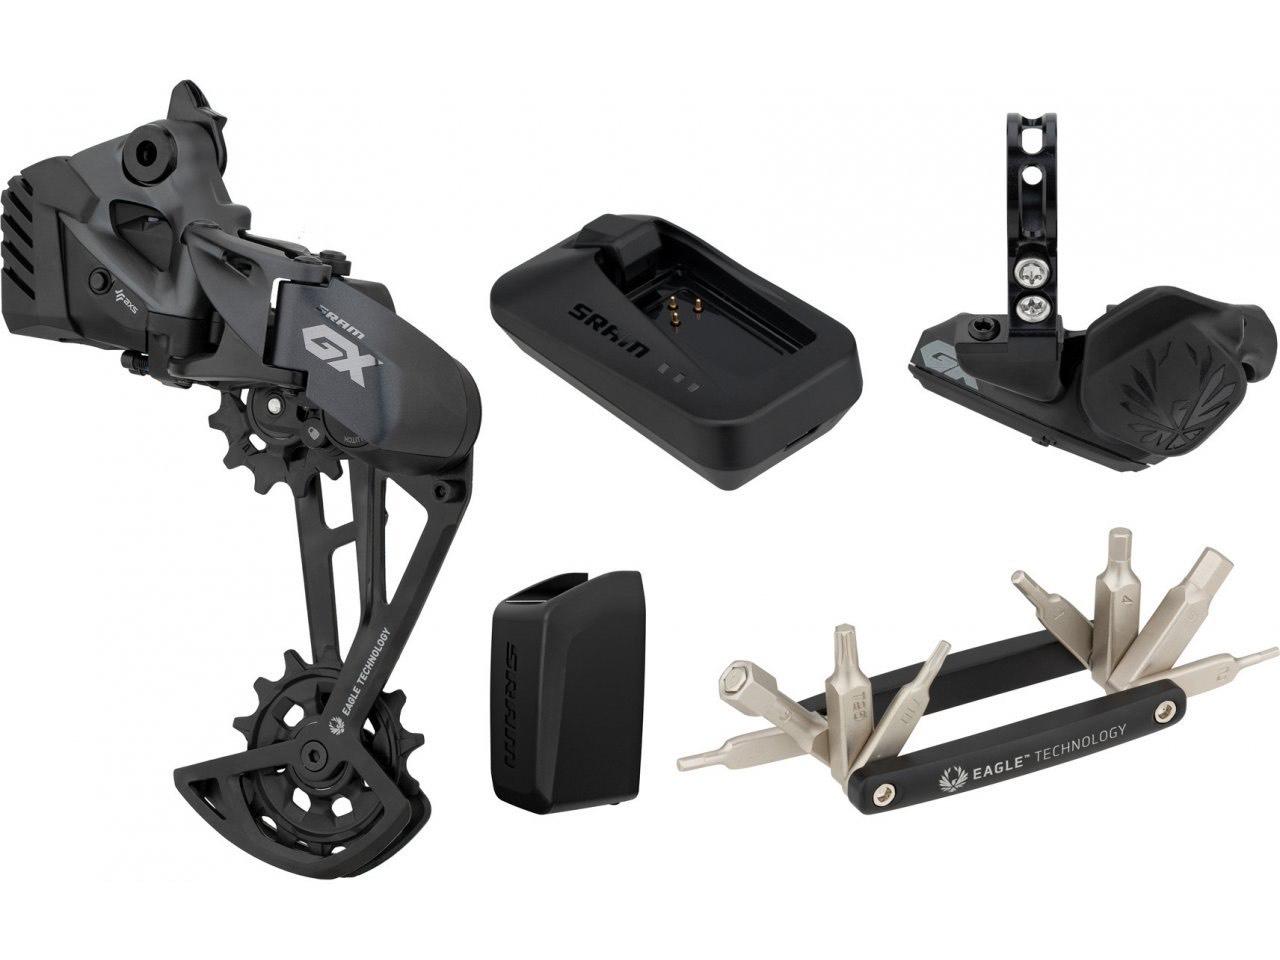 SRAM GX Eagle AXS 1x12-fach Upgrade-Kit